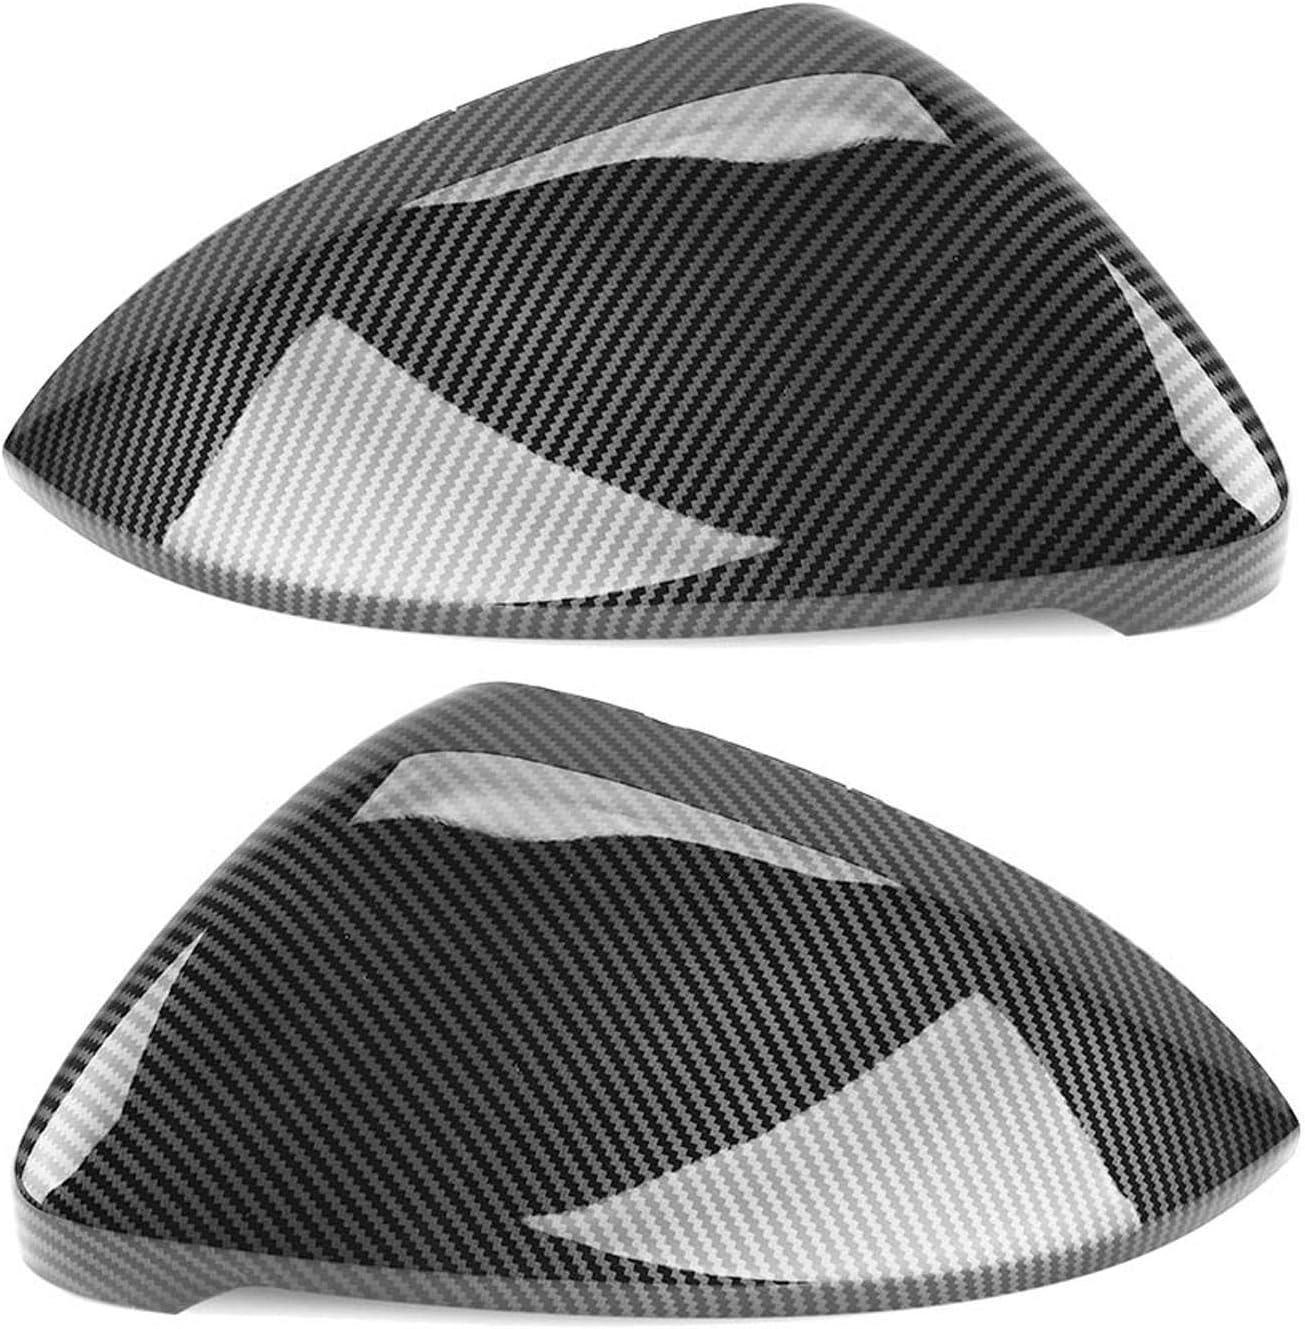 ATMASDO Carbon Fiber Pattern Philadelphia Mall Rearview Mirror Case OFFicial shop for G Cover VW